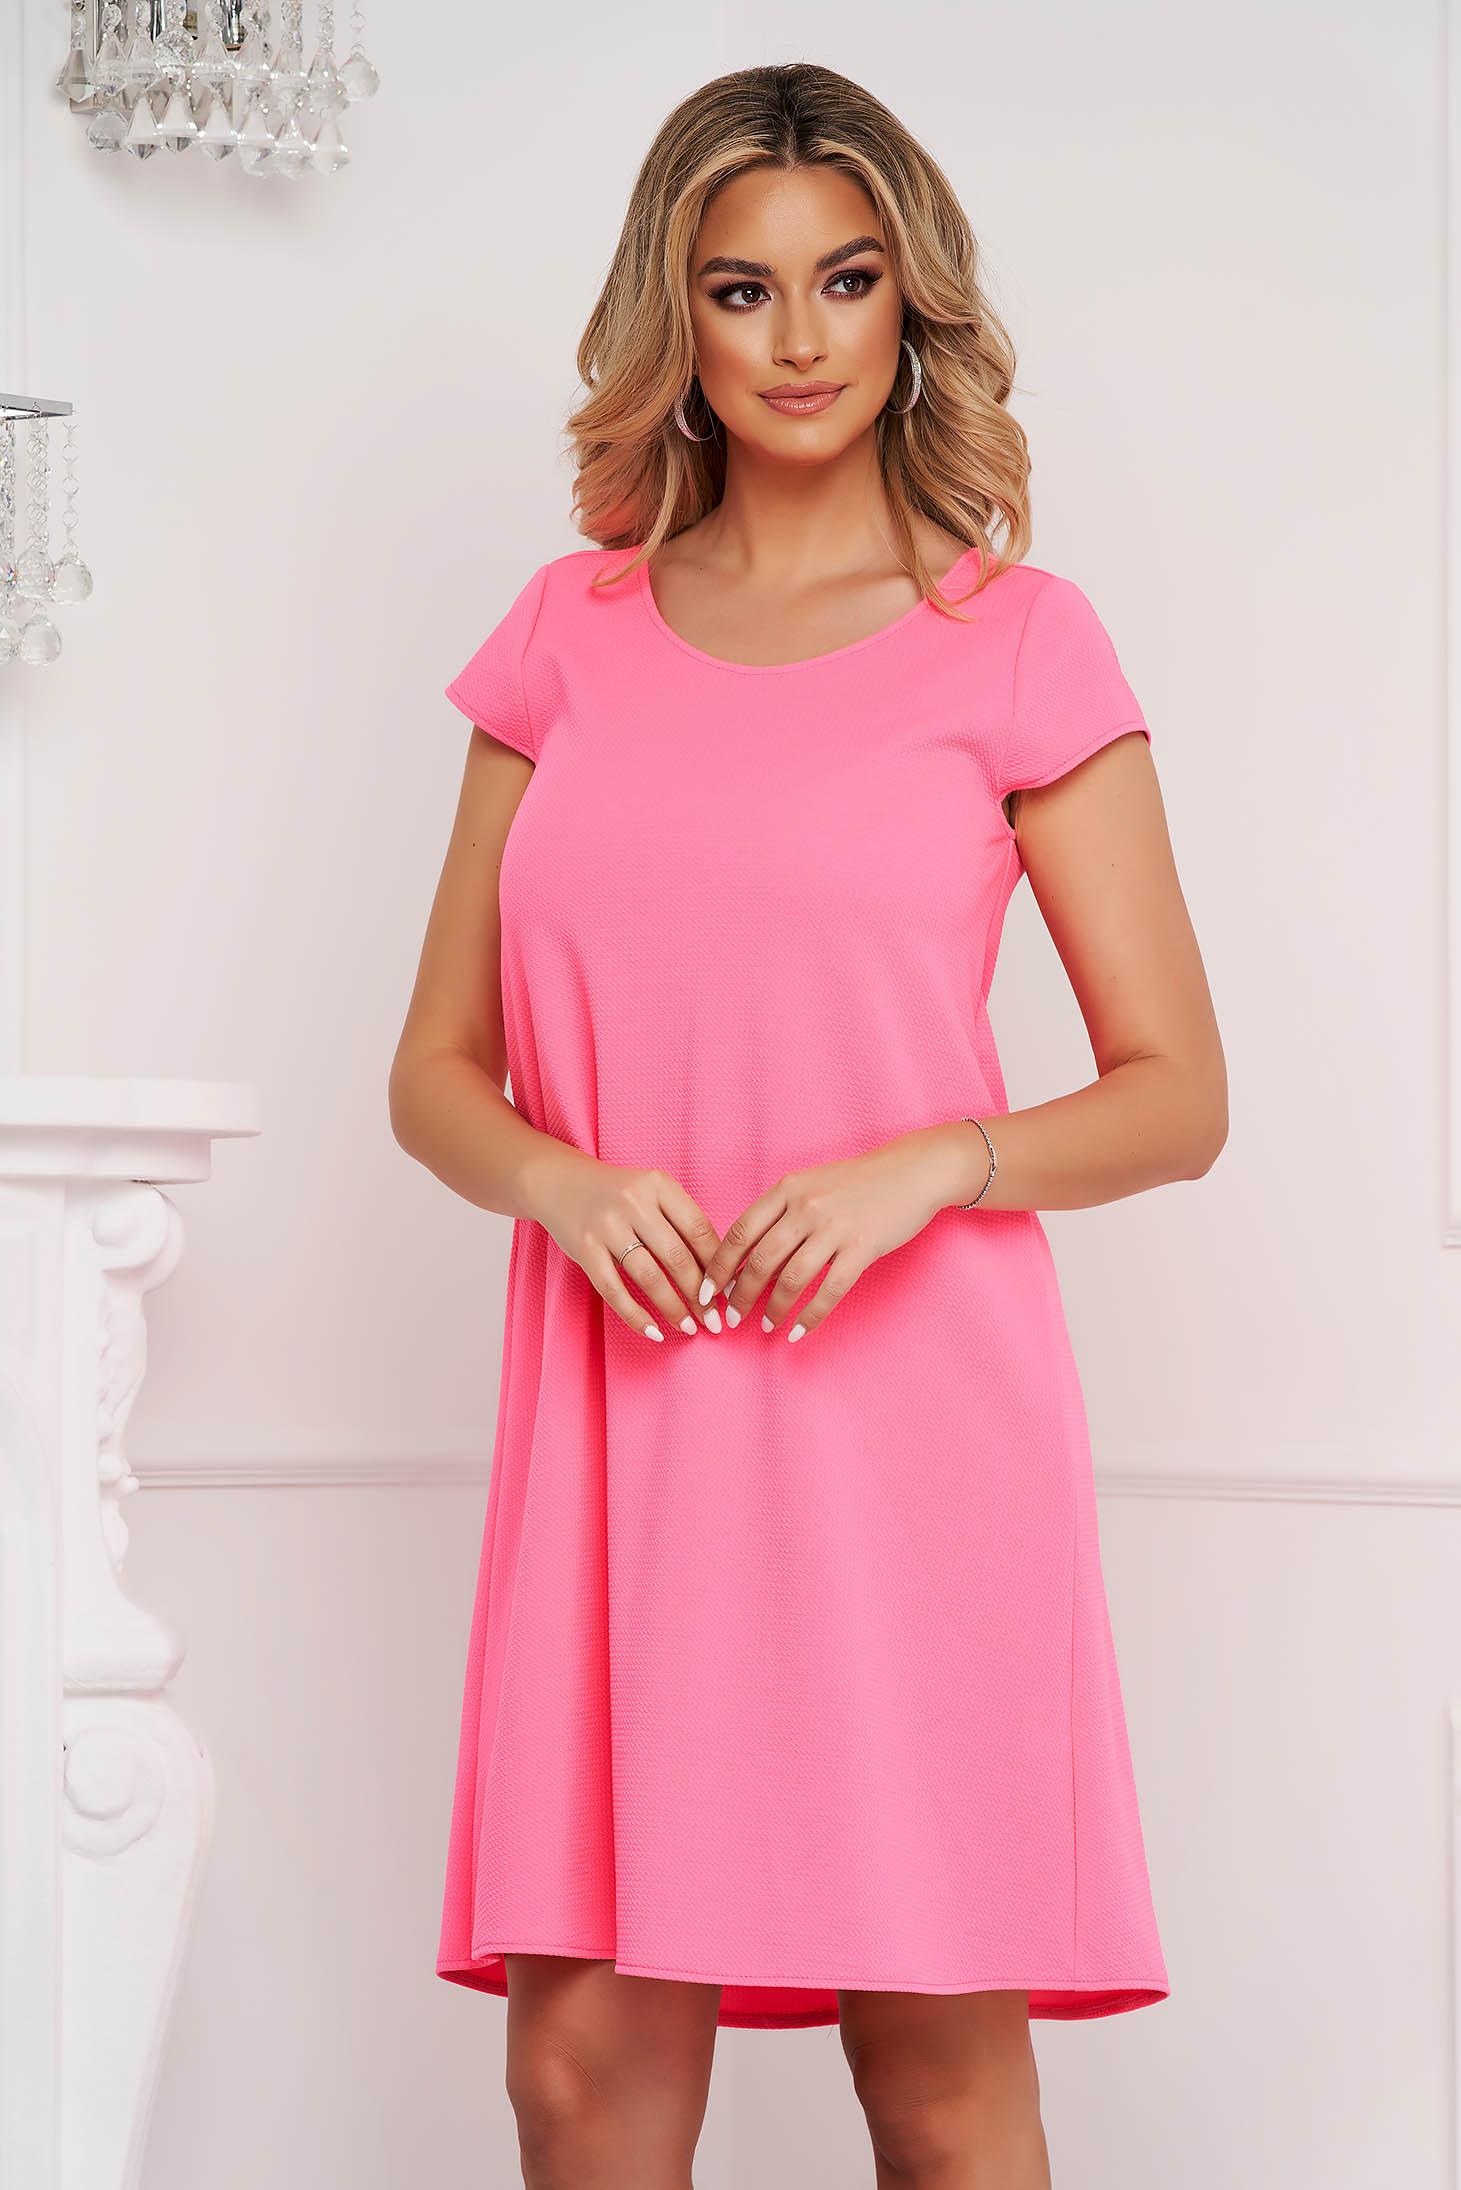 Rochie StarShinerS roz scurta din material creponat cu croi larg si spatele decupat